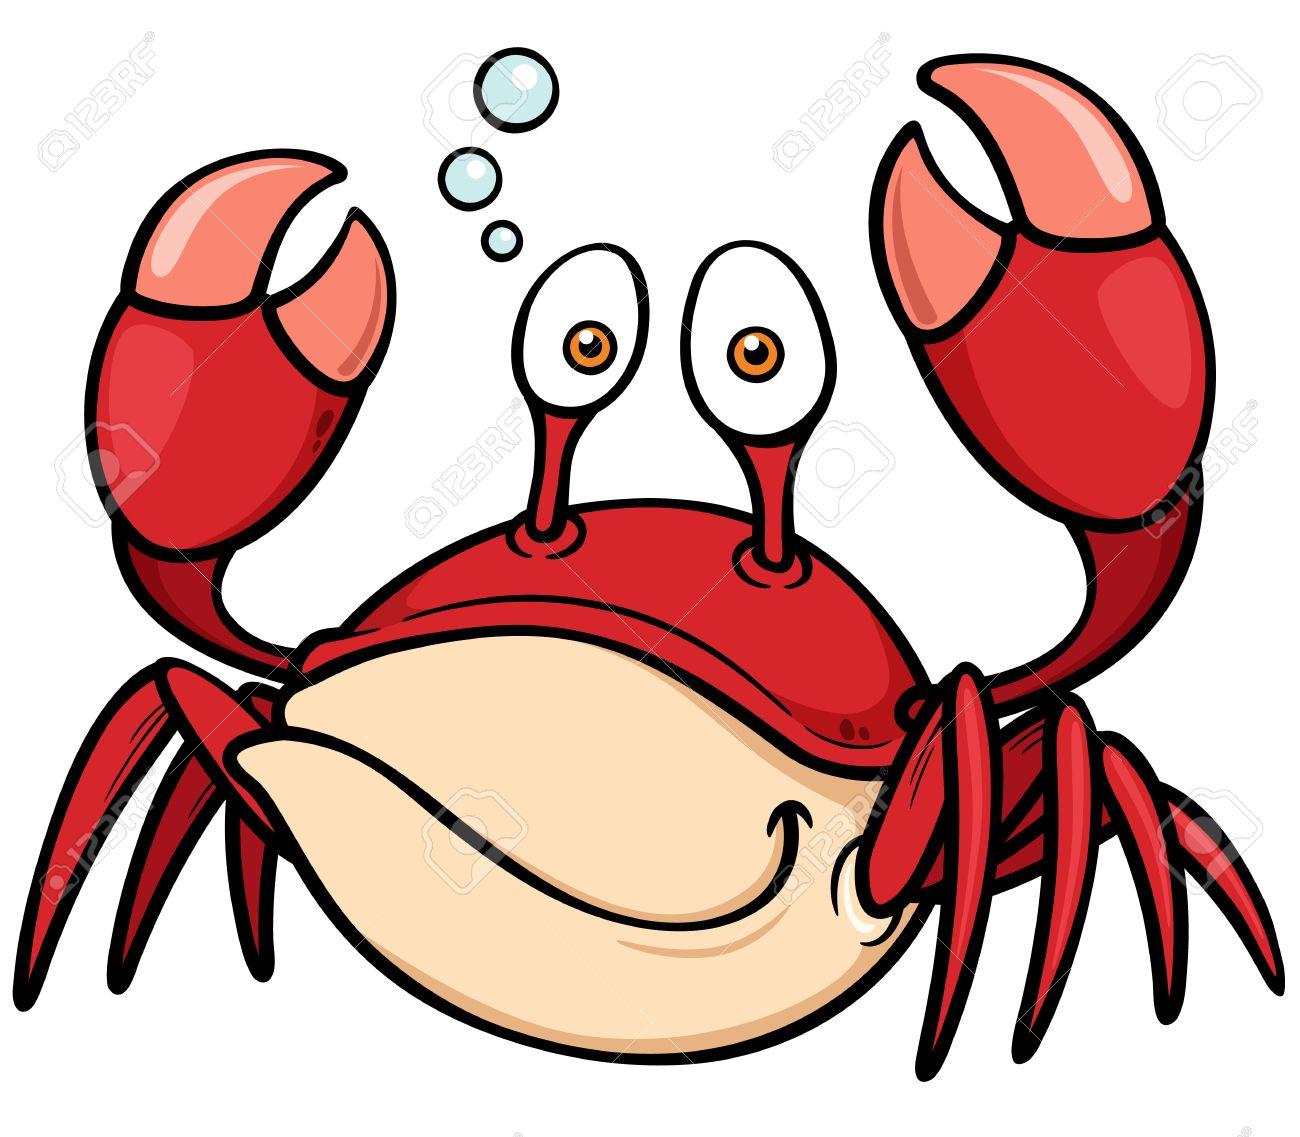 1300x1137 Vector Illustration Of Cartoon Crab Royalty Free Cliparts, Vectors